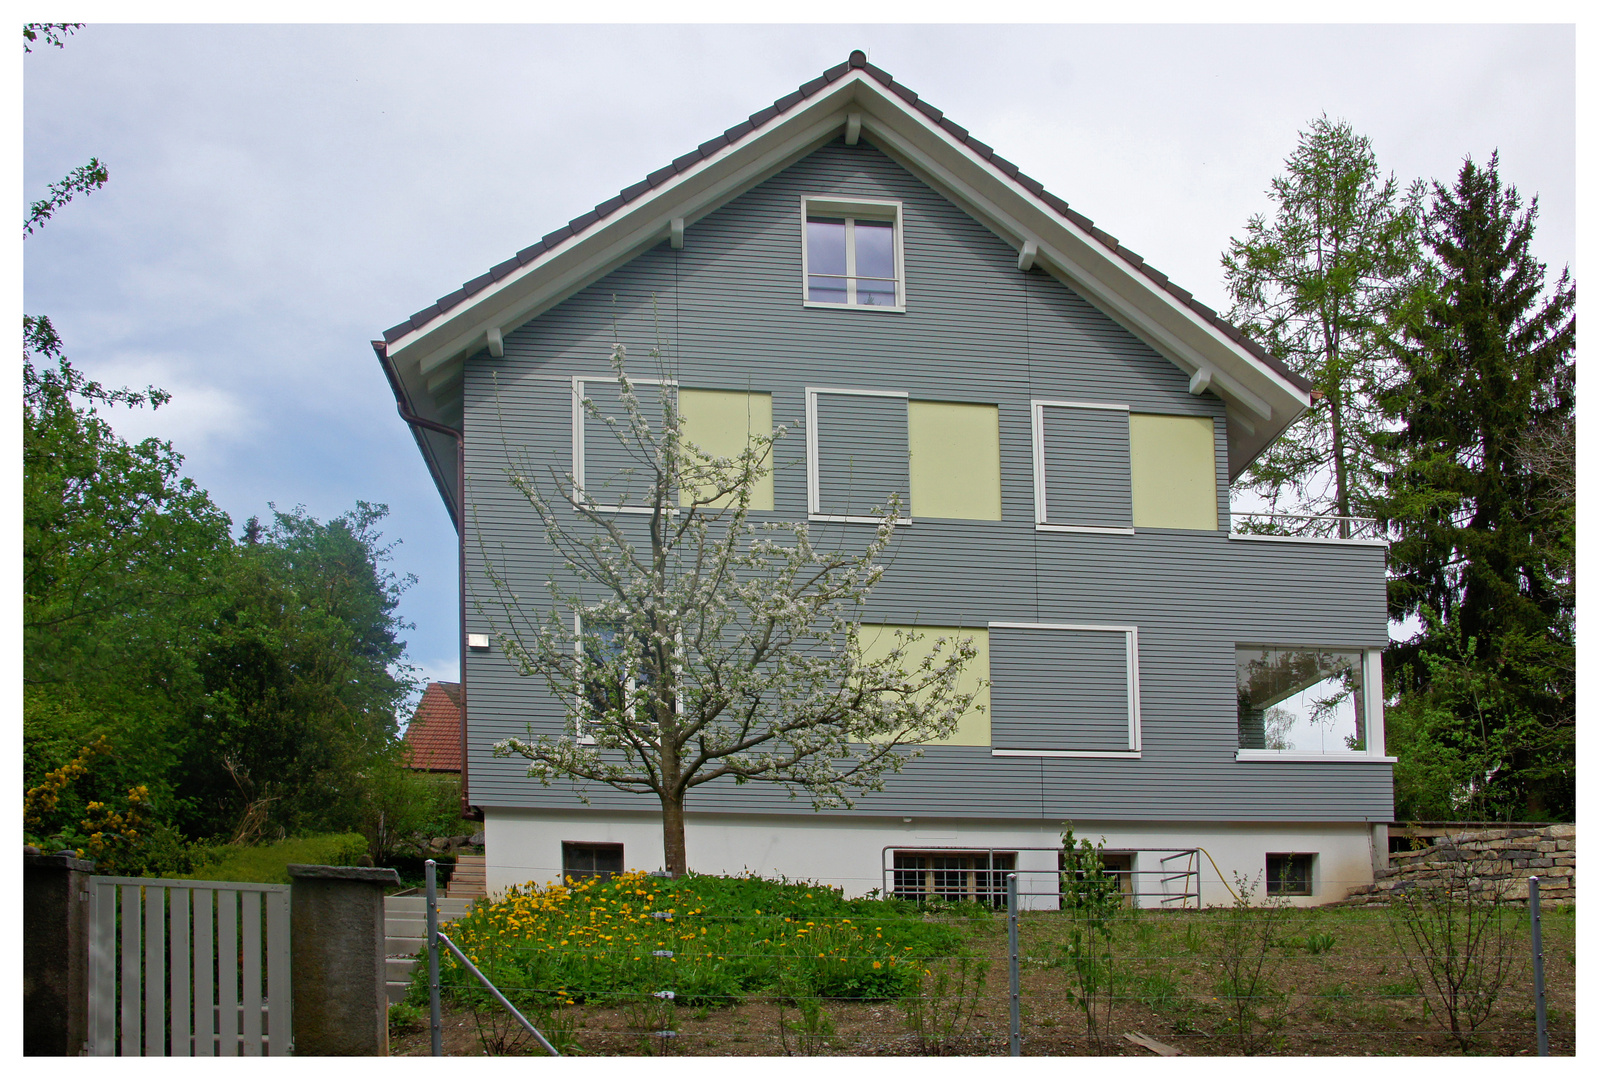 1936 erbaut, 2011 renoviert